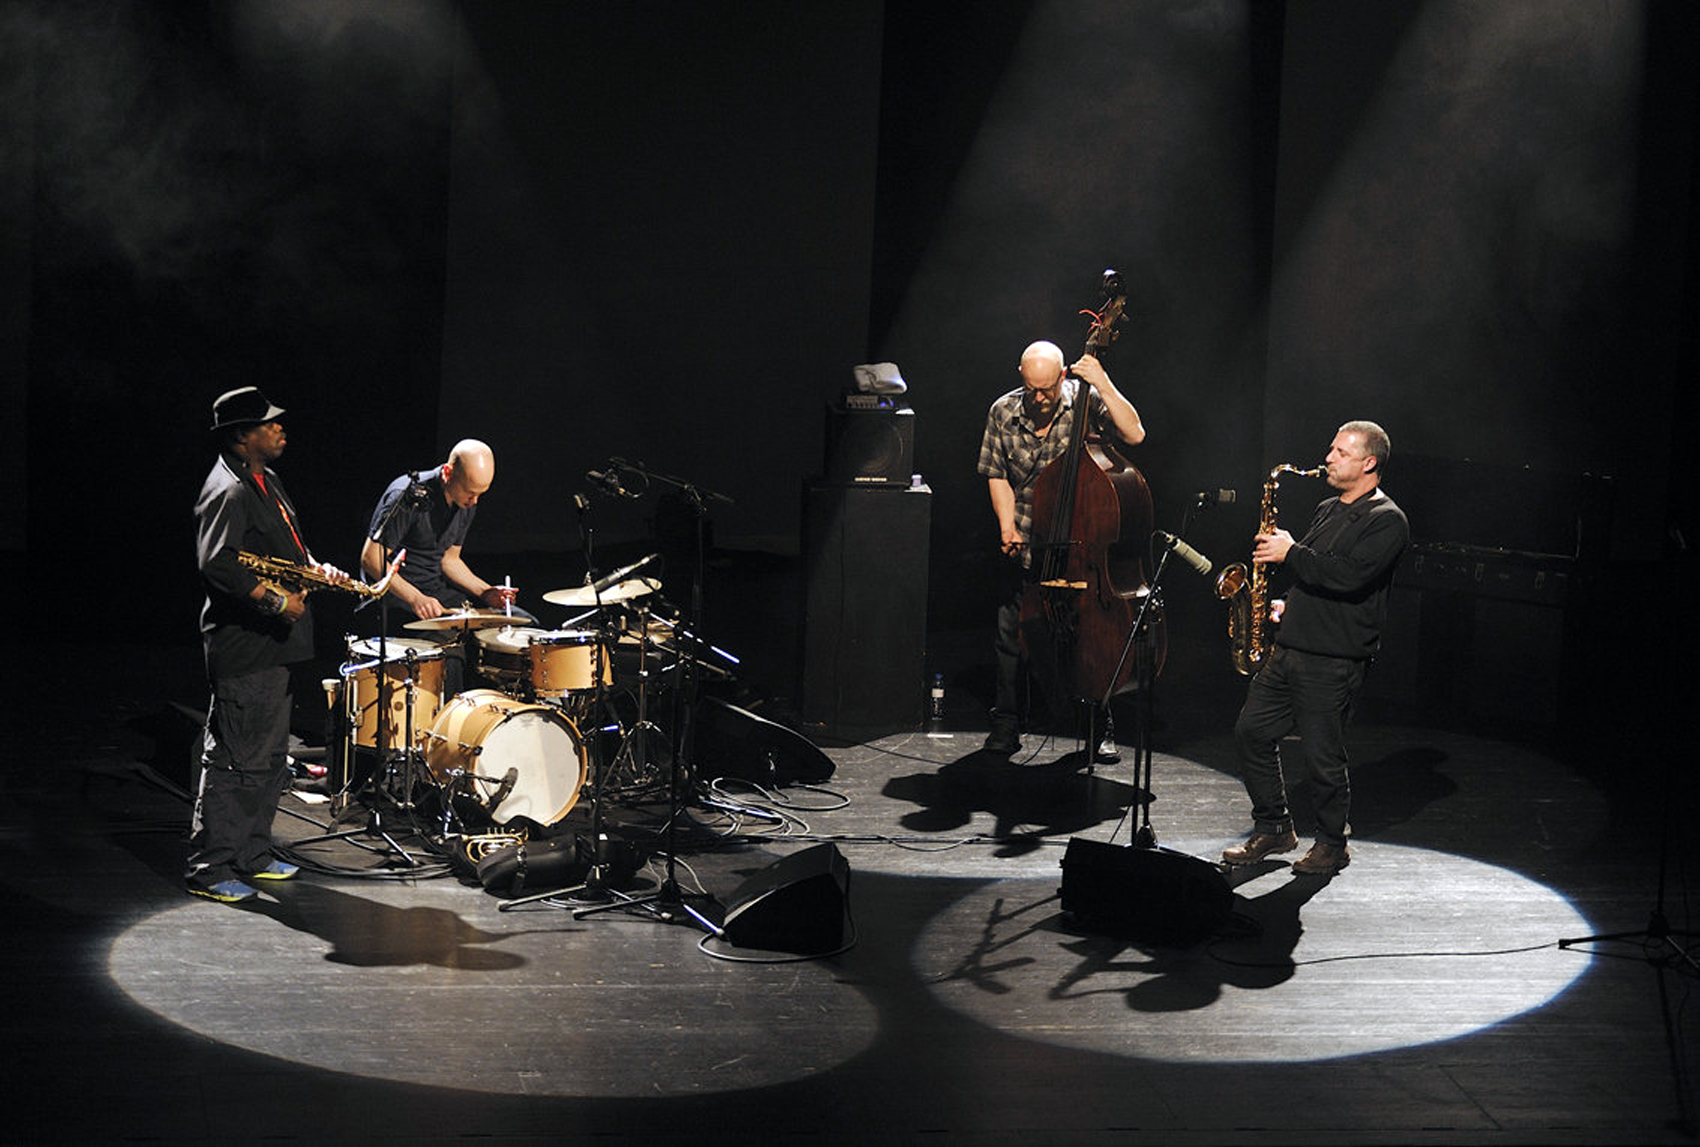 1/3 Amado – McPhee – Corsano – Kessler + Di Domenico – Almeida – Pándi at De Singer